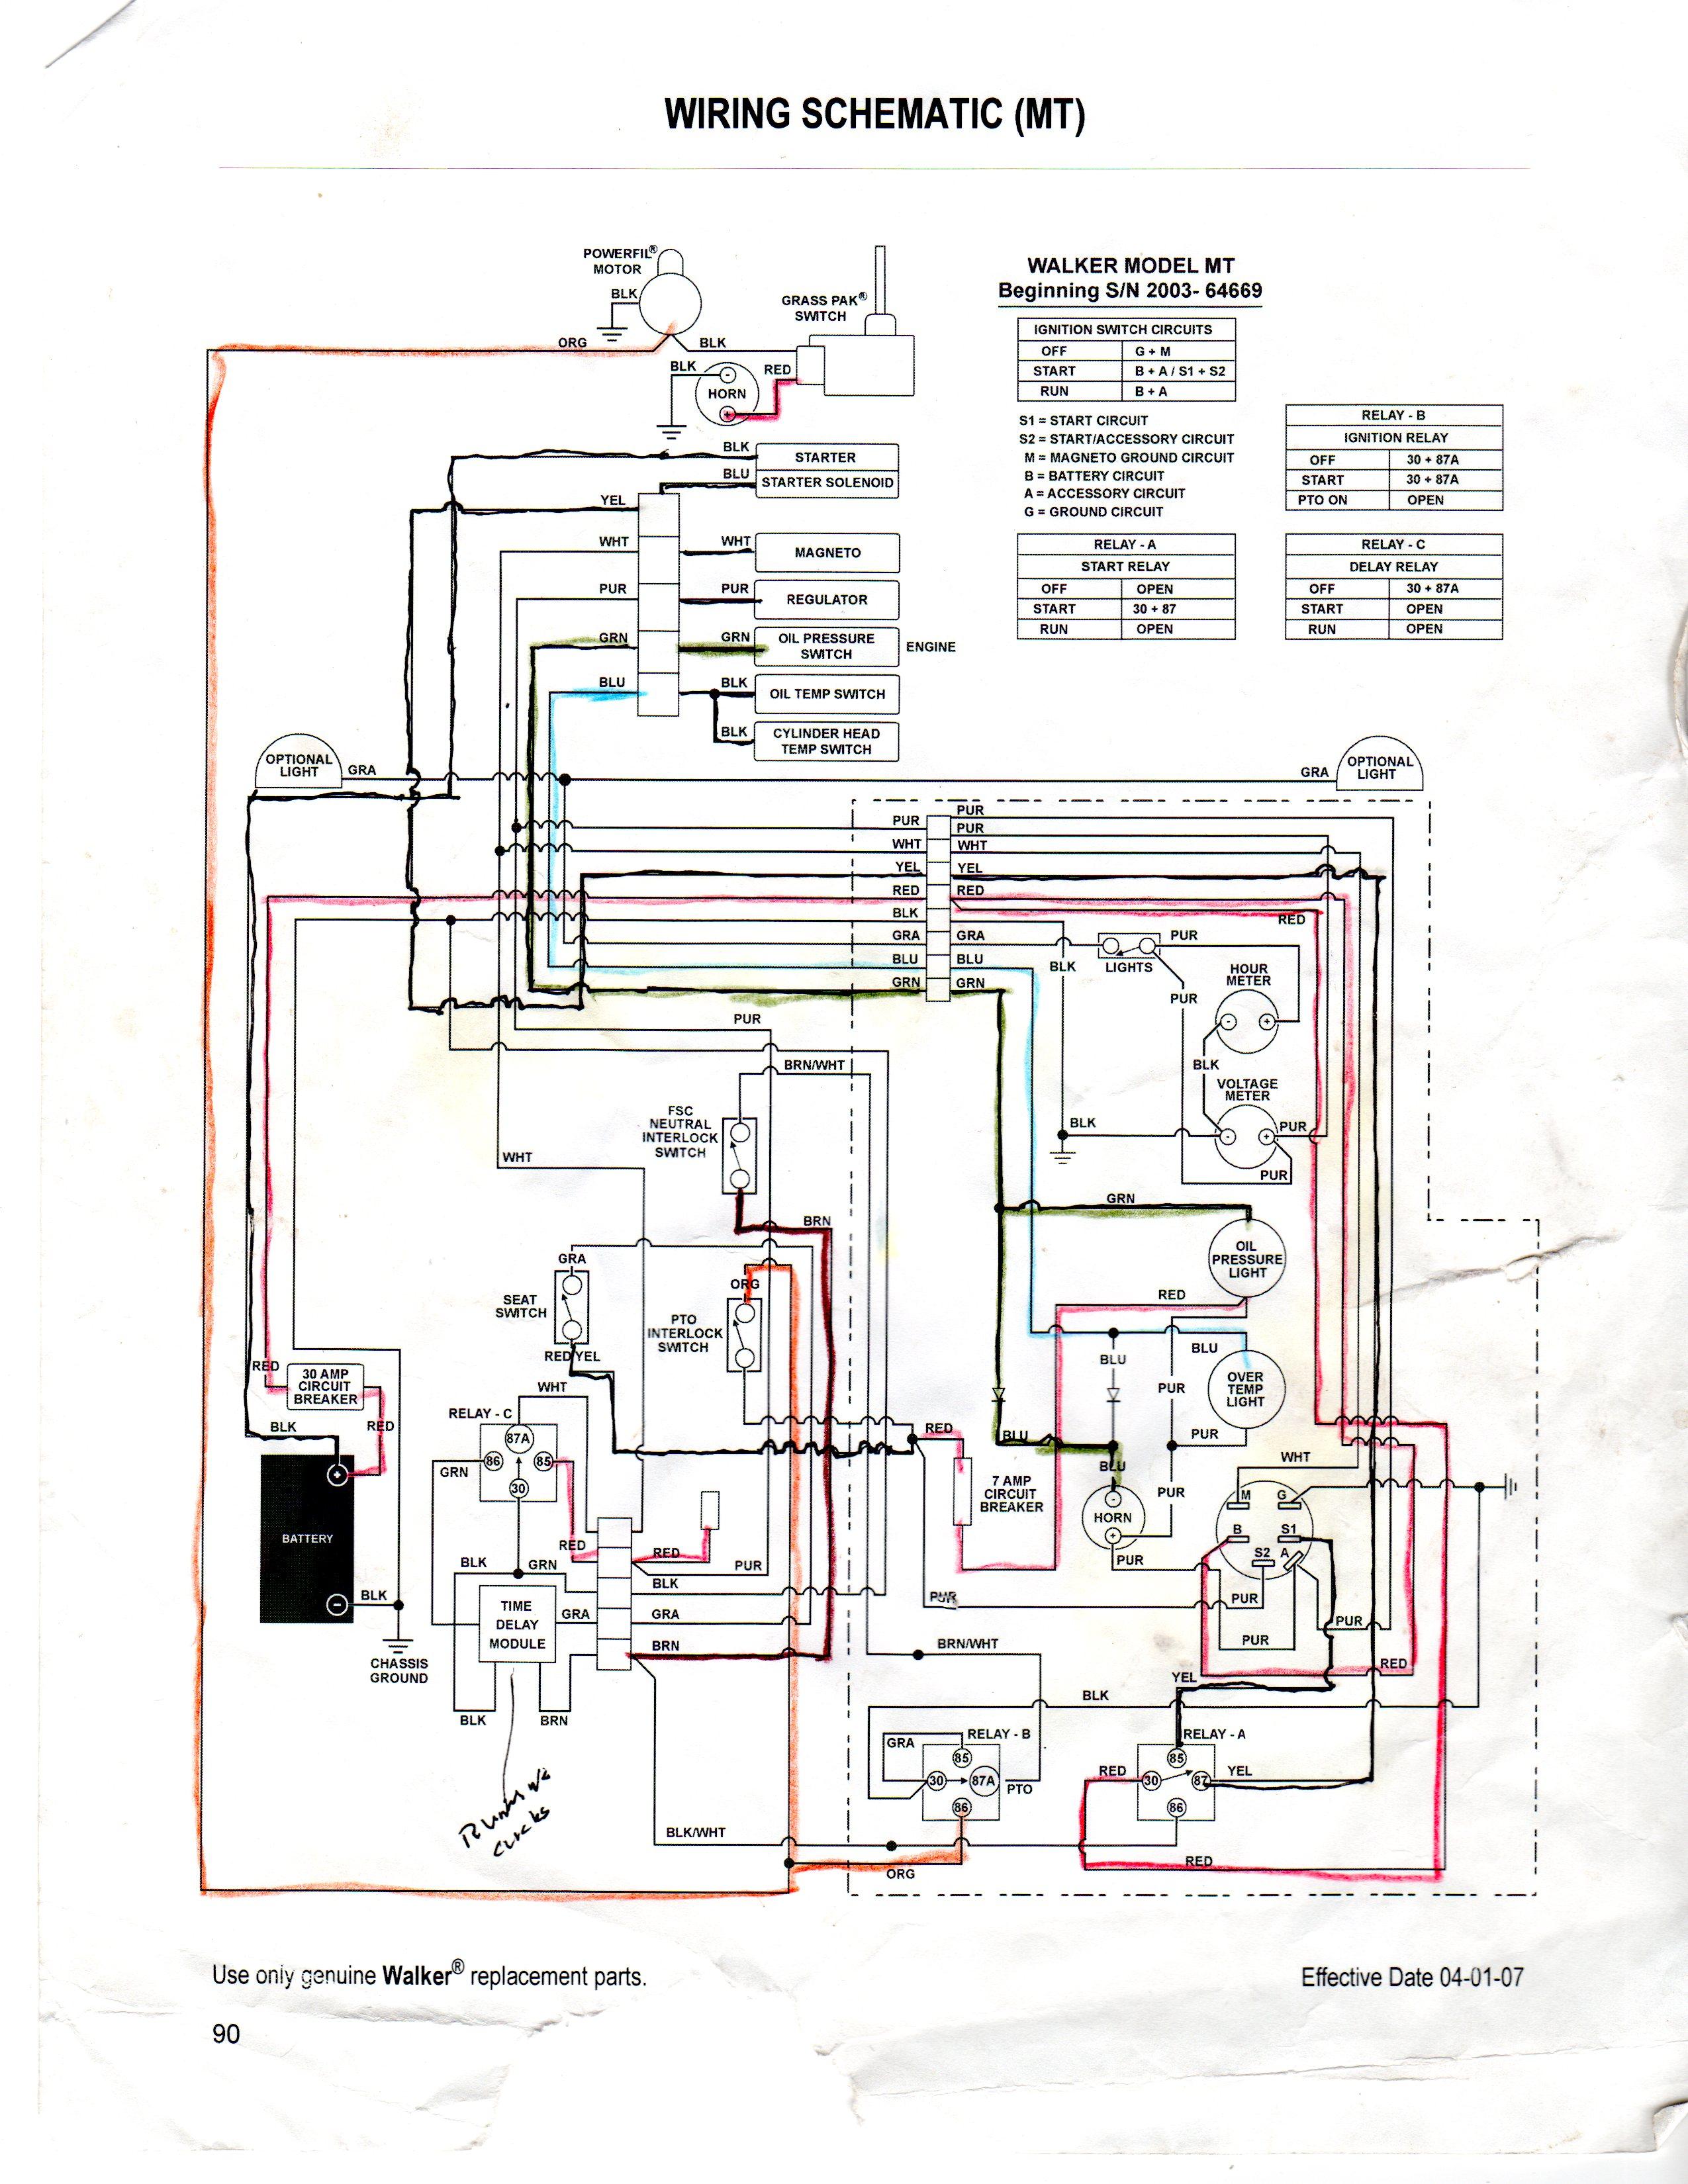 1046 cub cadet charging system wiring diagram